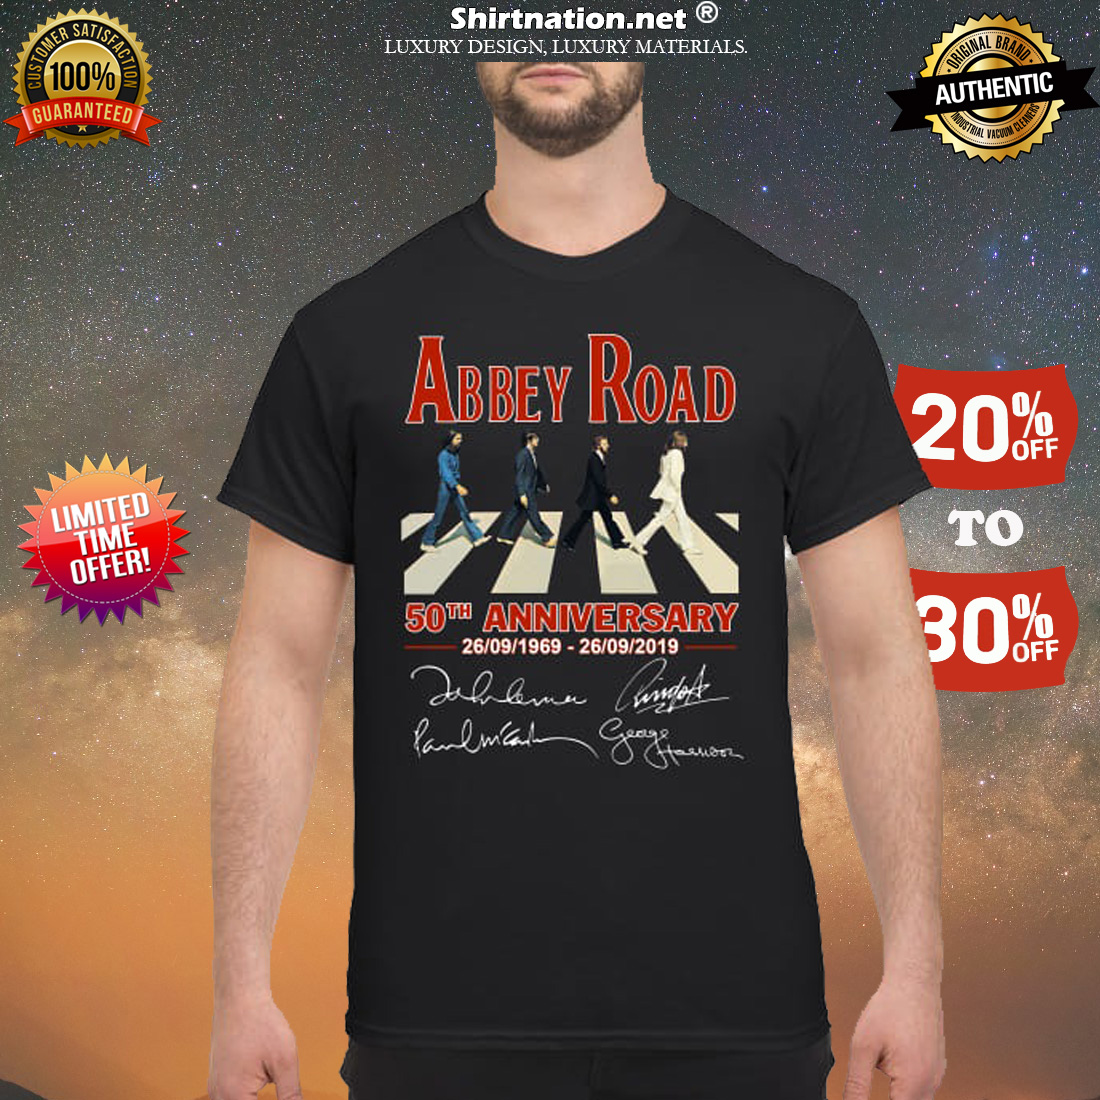 Abbey Road 50th anniversary signatures shirt